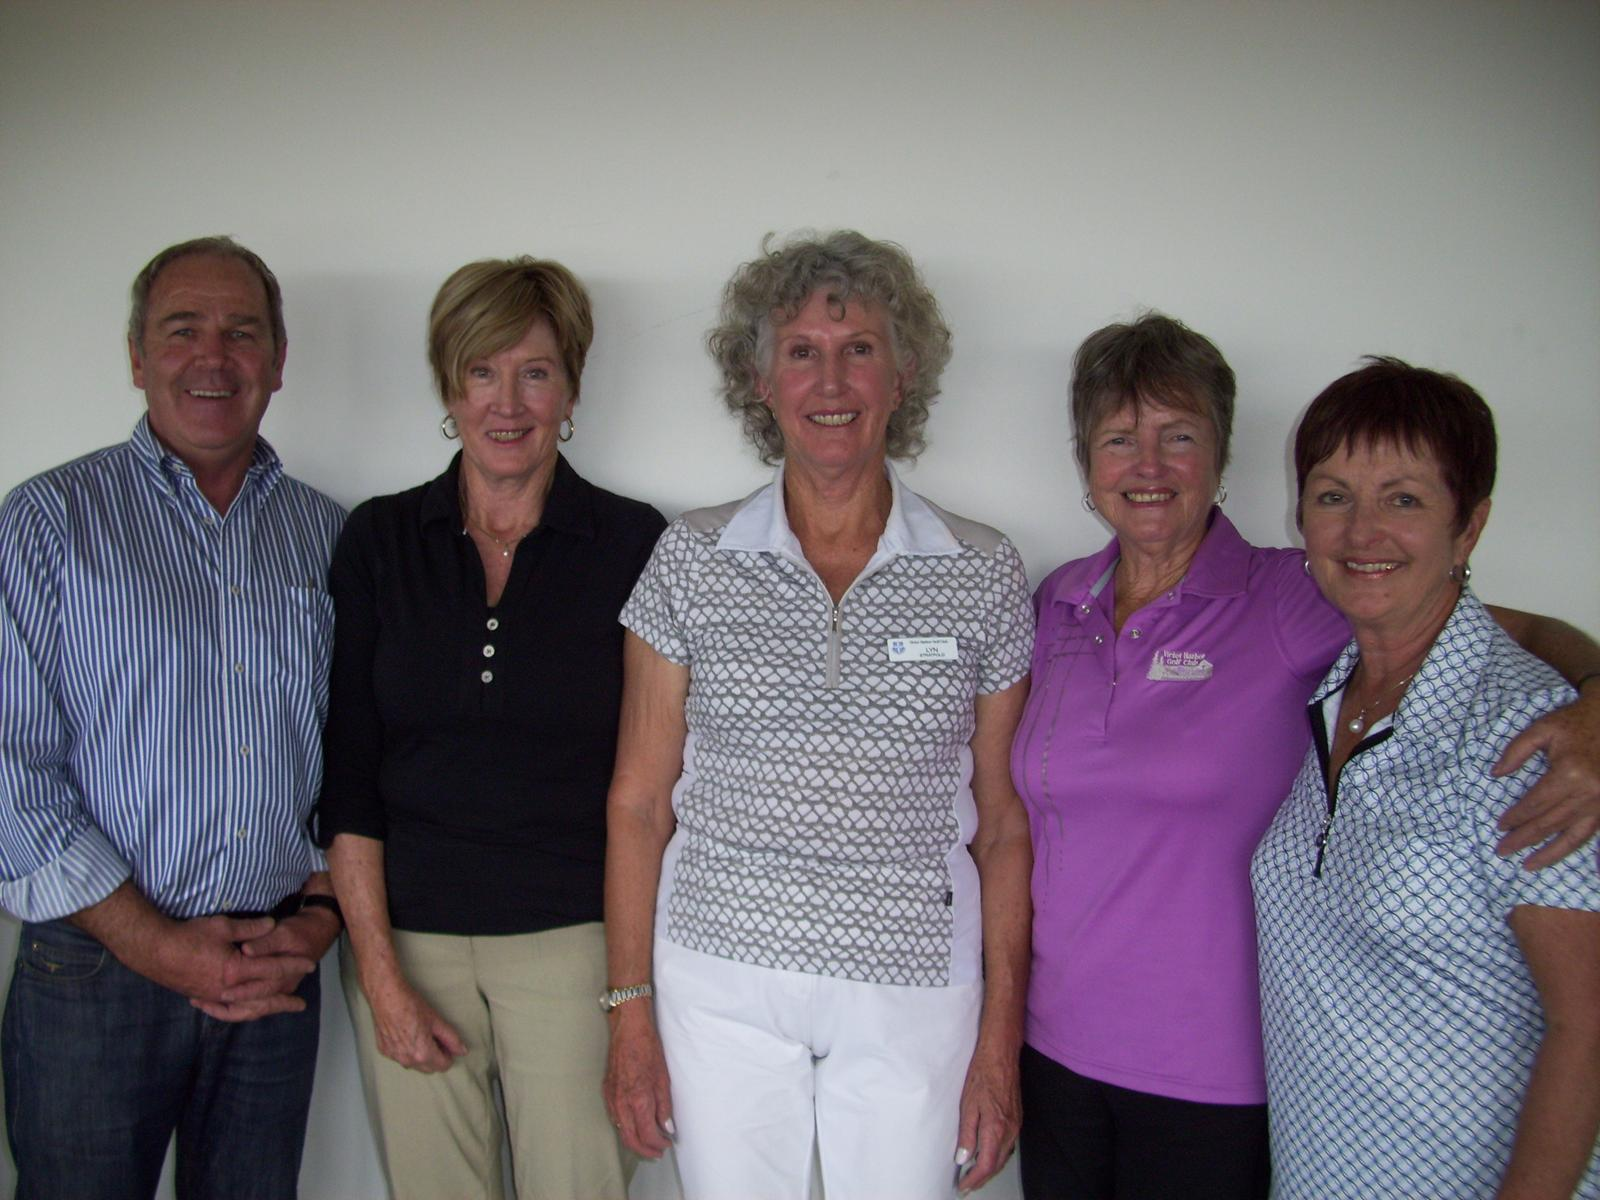 L to R: Alan Kluske, Julie Howard, Lyn Stratfold, Marie Wickstein and Bev Kluske